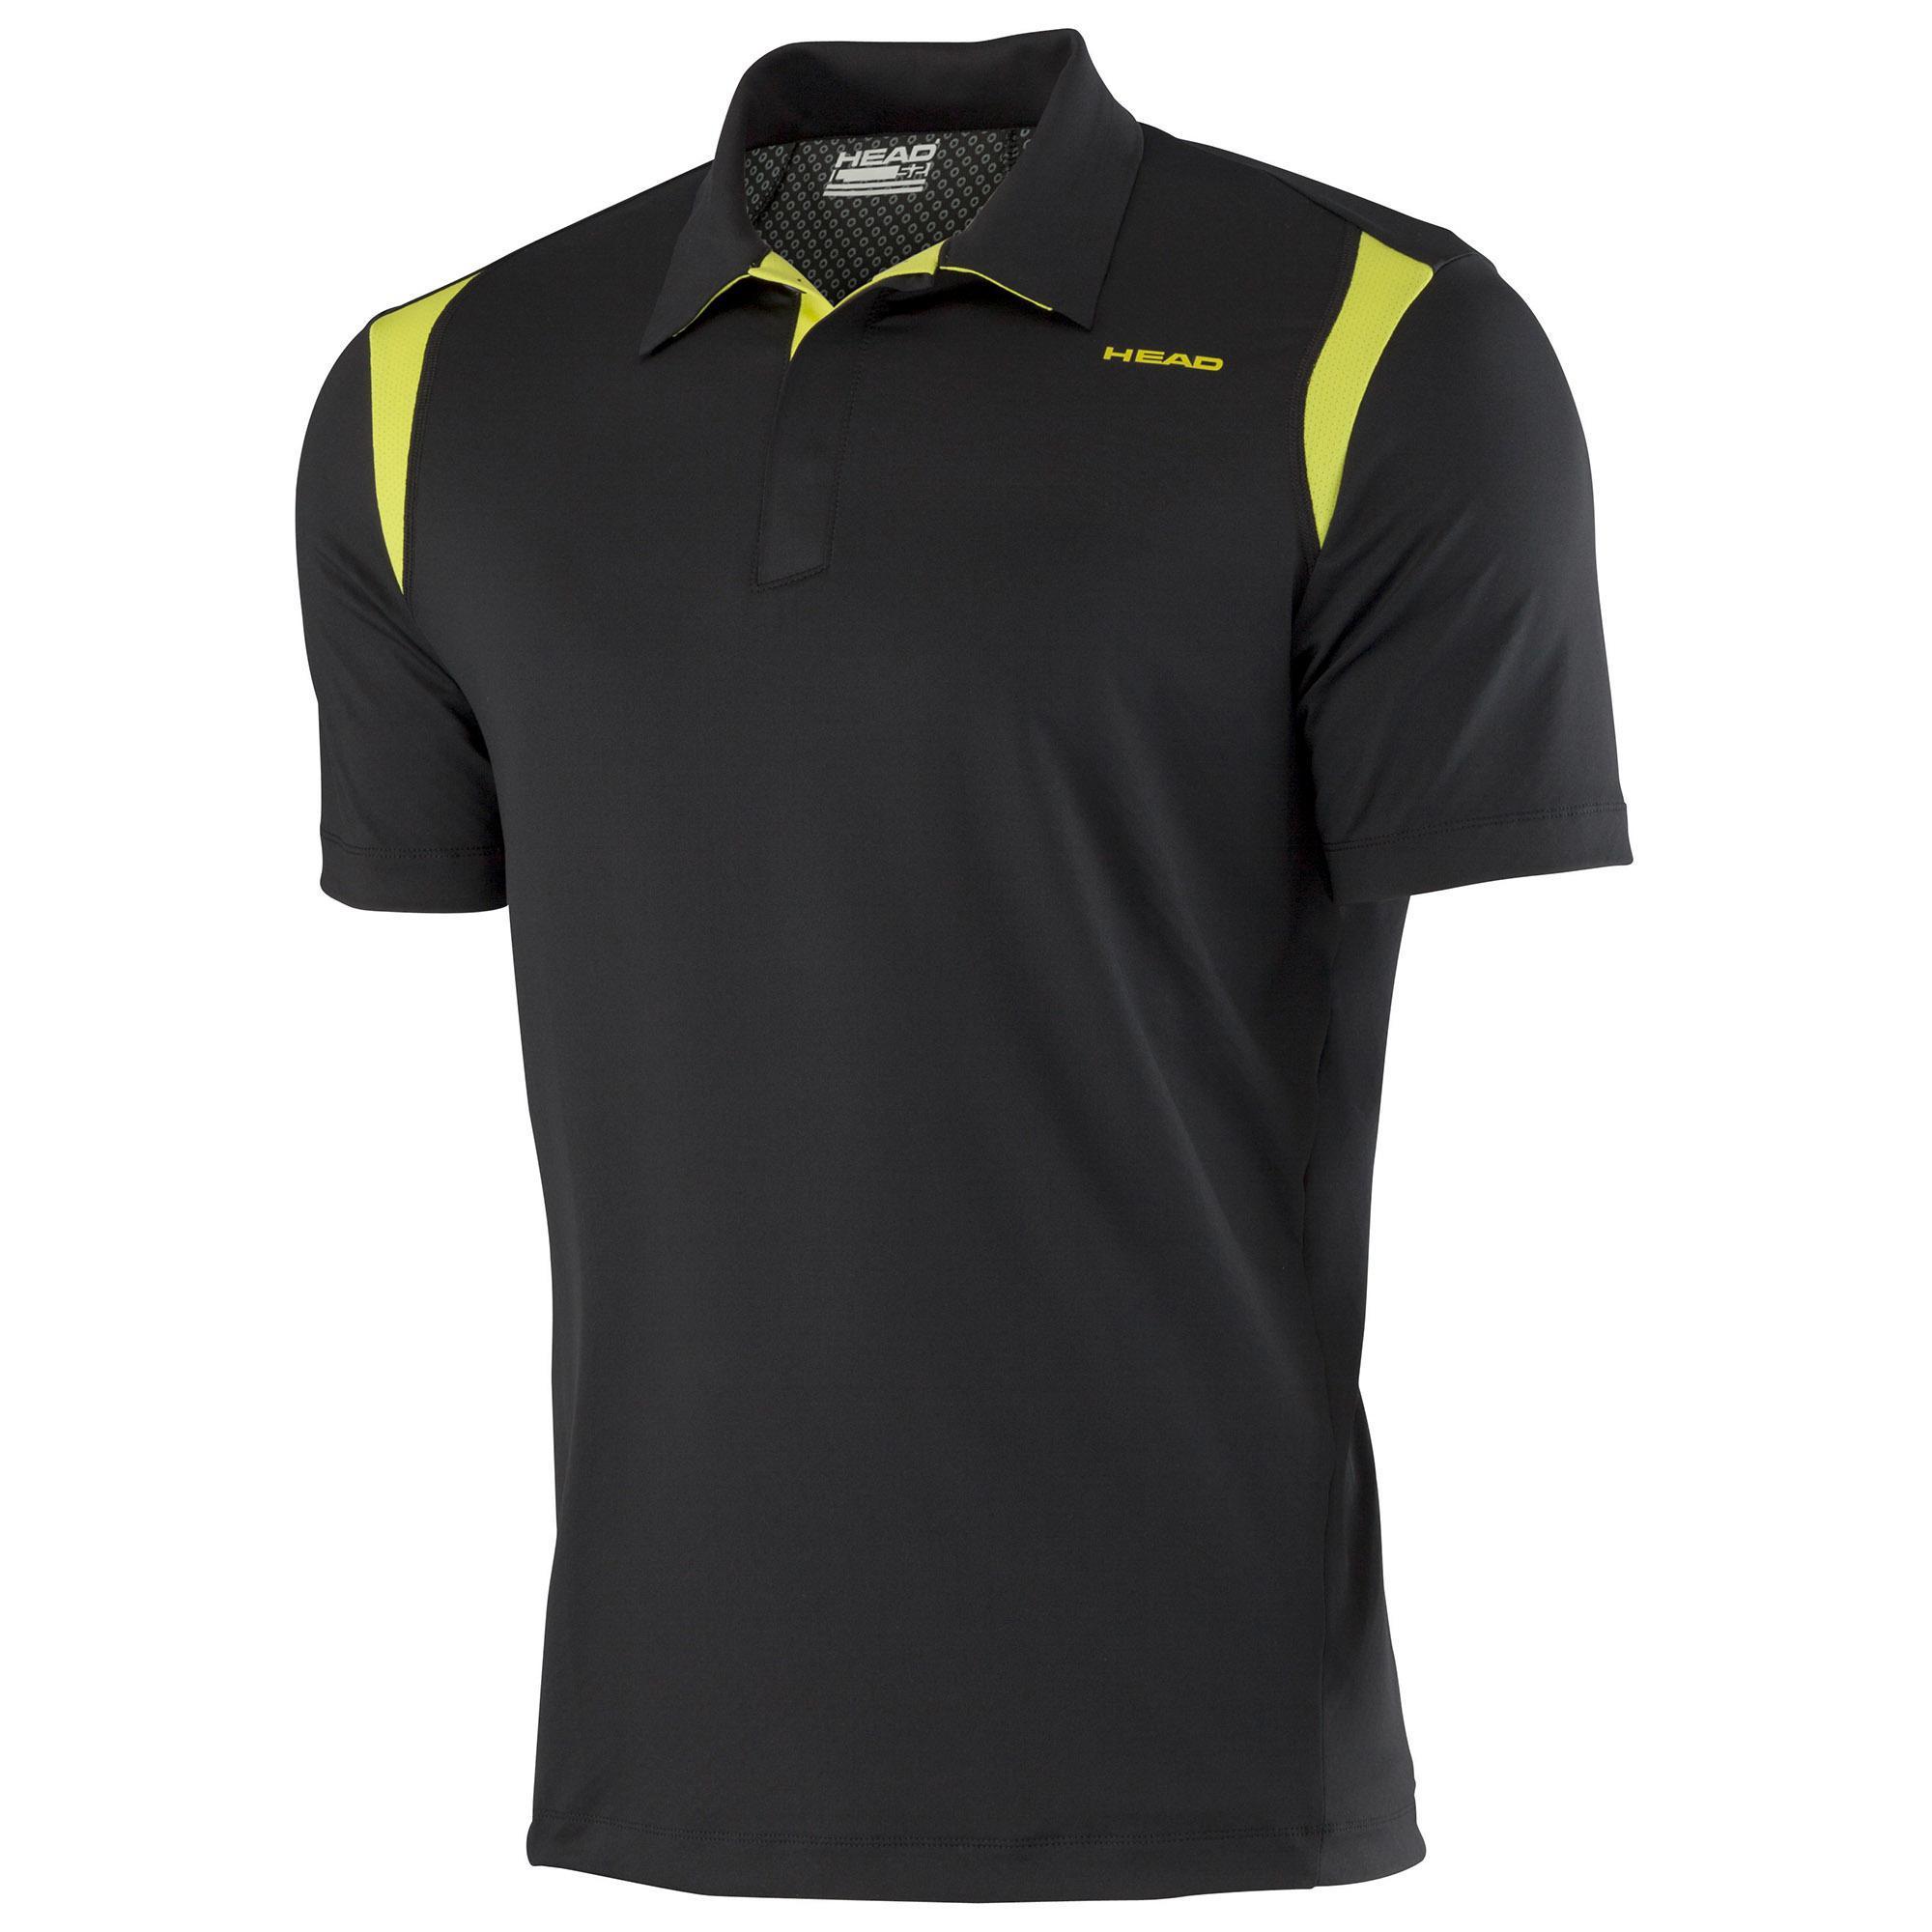 Head mens performance cool polo shirt black lime for Cool mens polo shirts